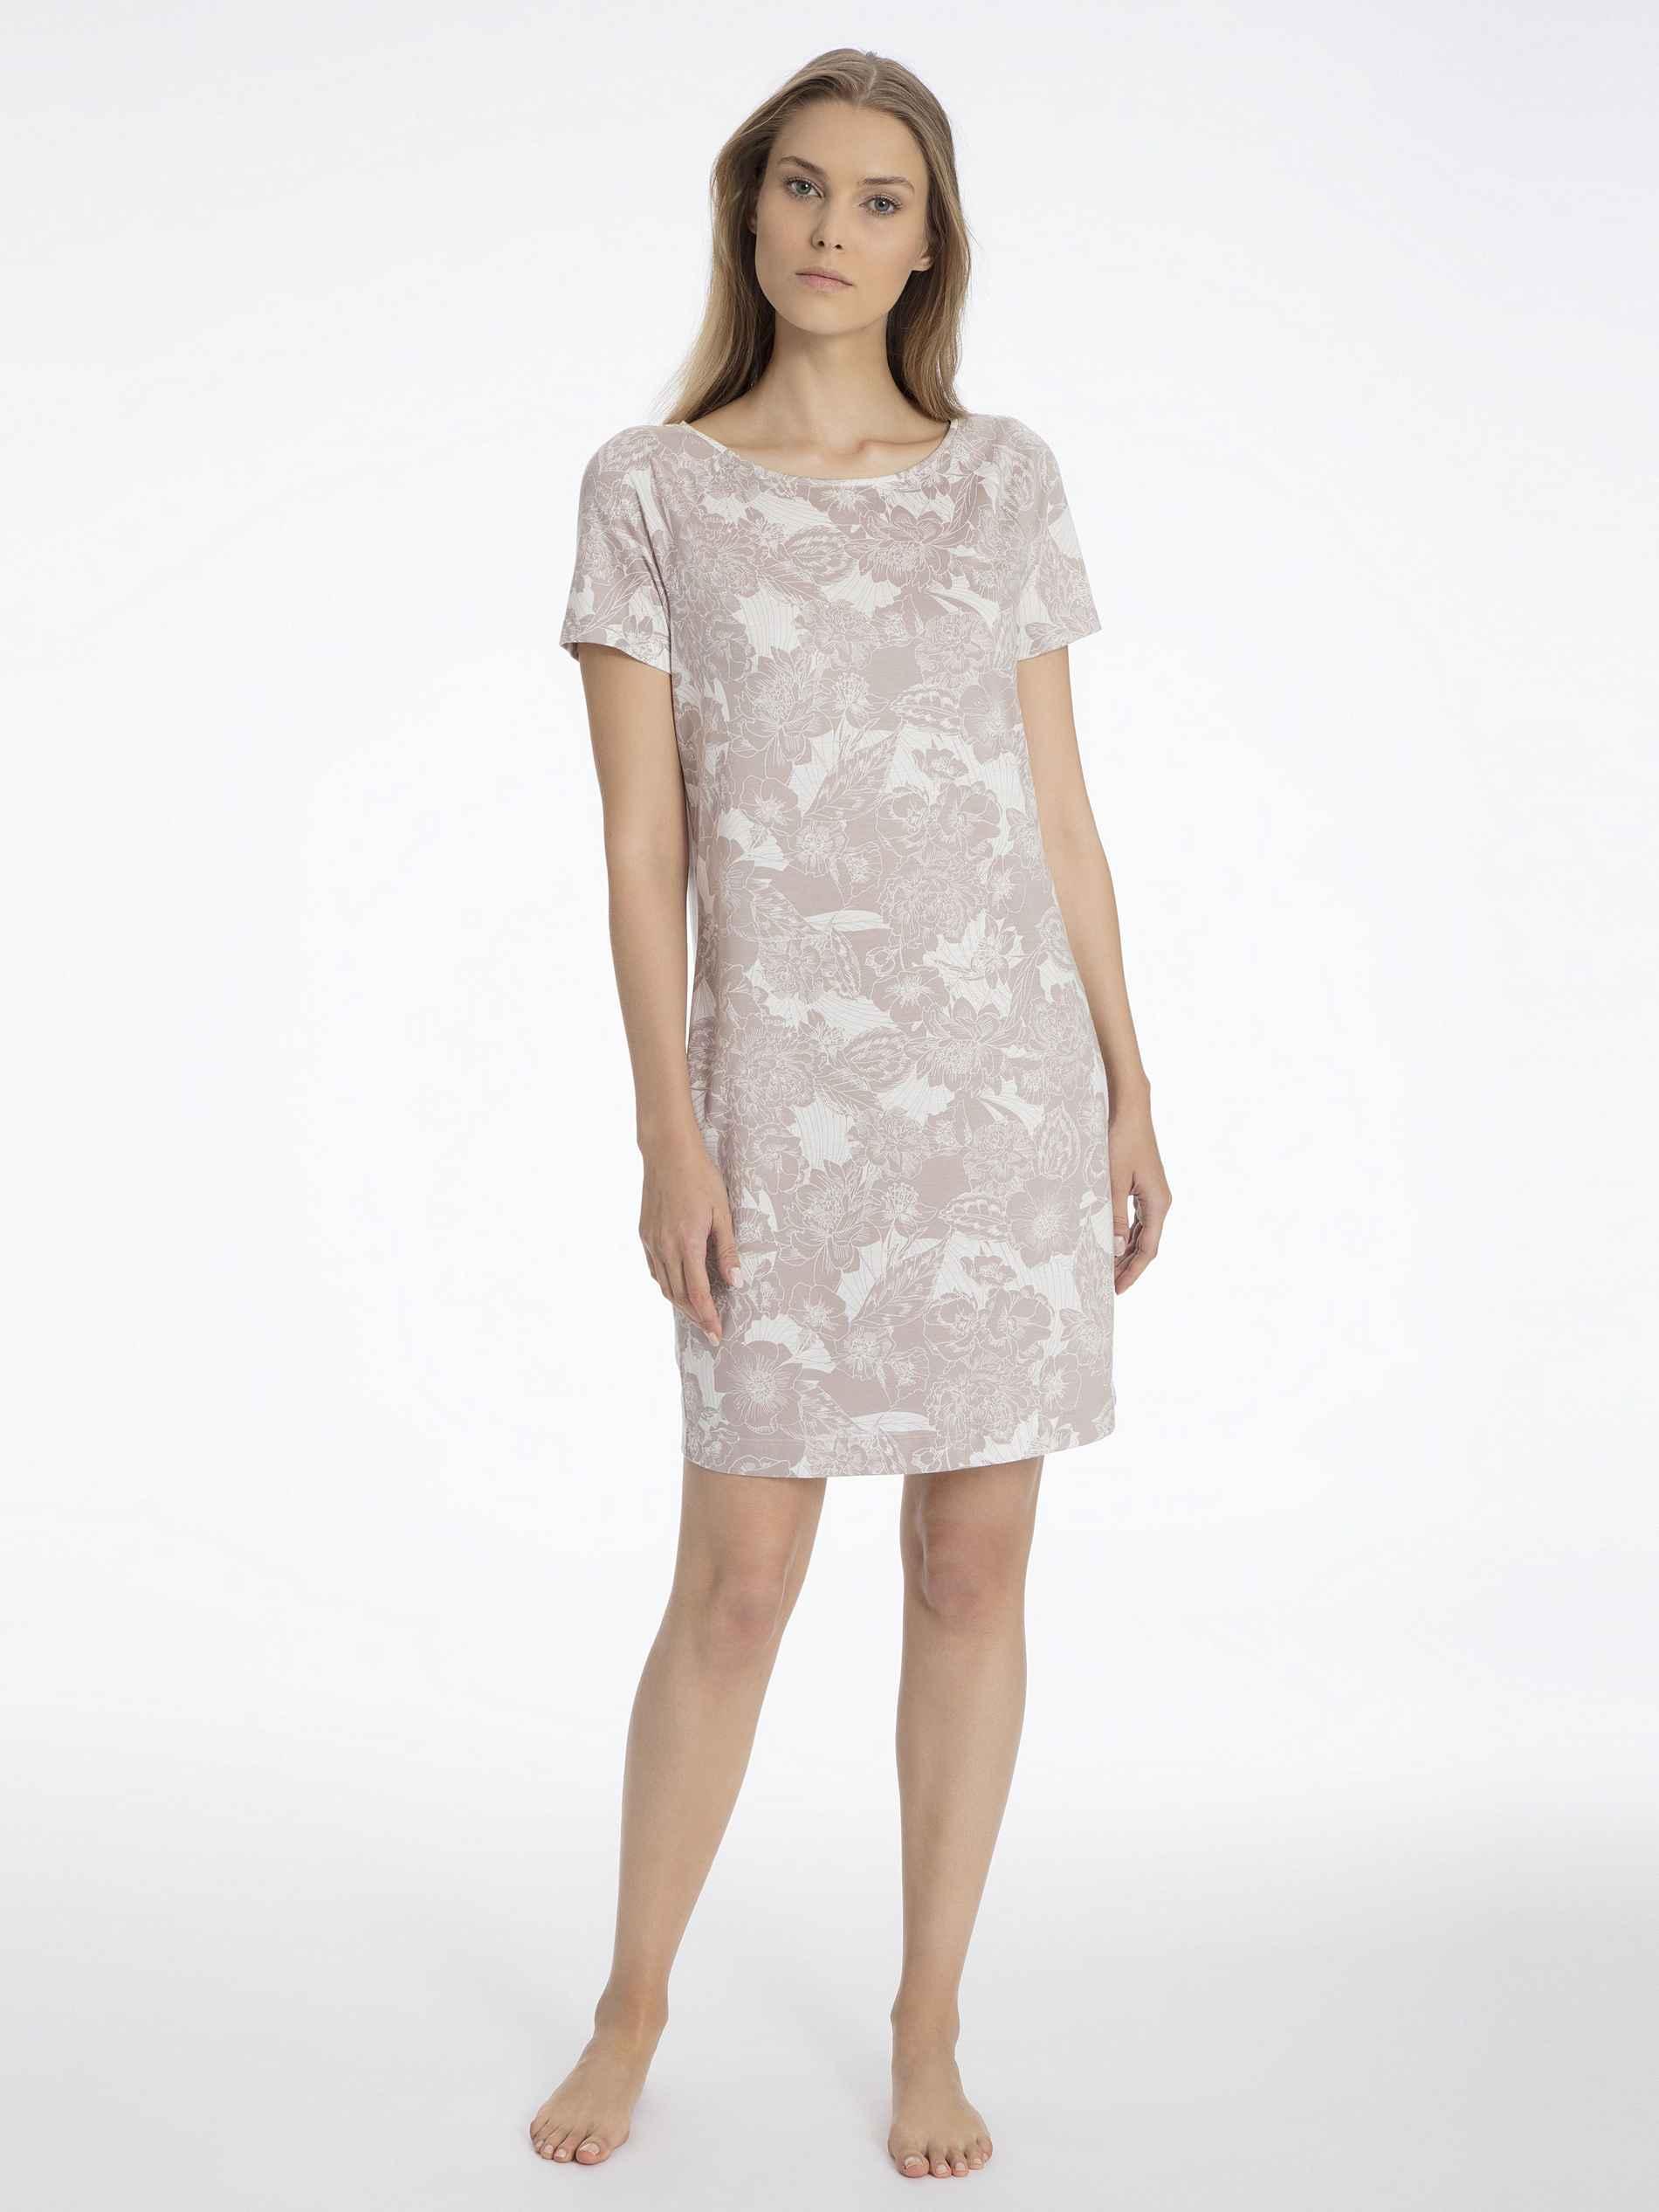 CALIDA Lilly Sleepshirt, Länge 90cm   Bekleidung > Nachtwäsche > Sleepshirts   CALIDA